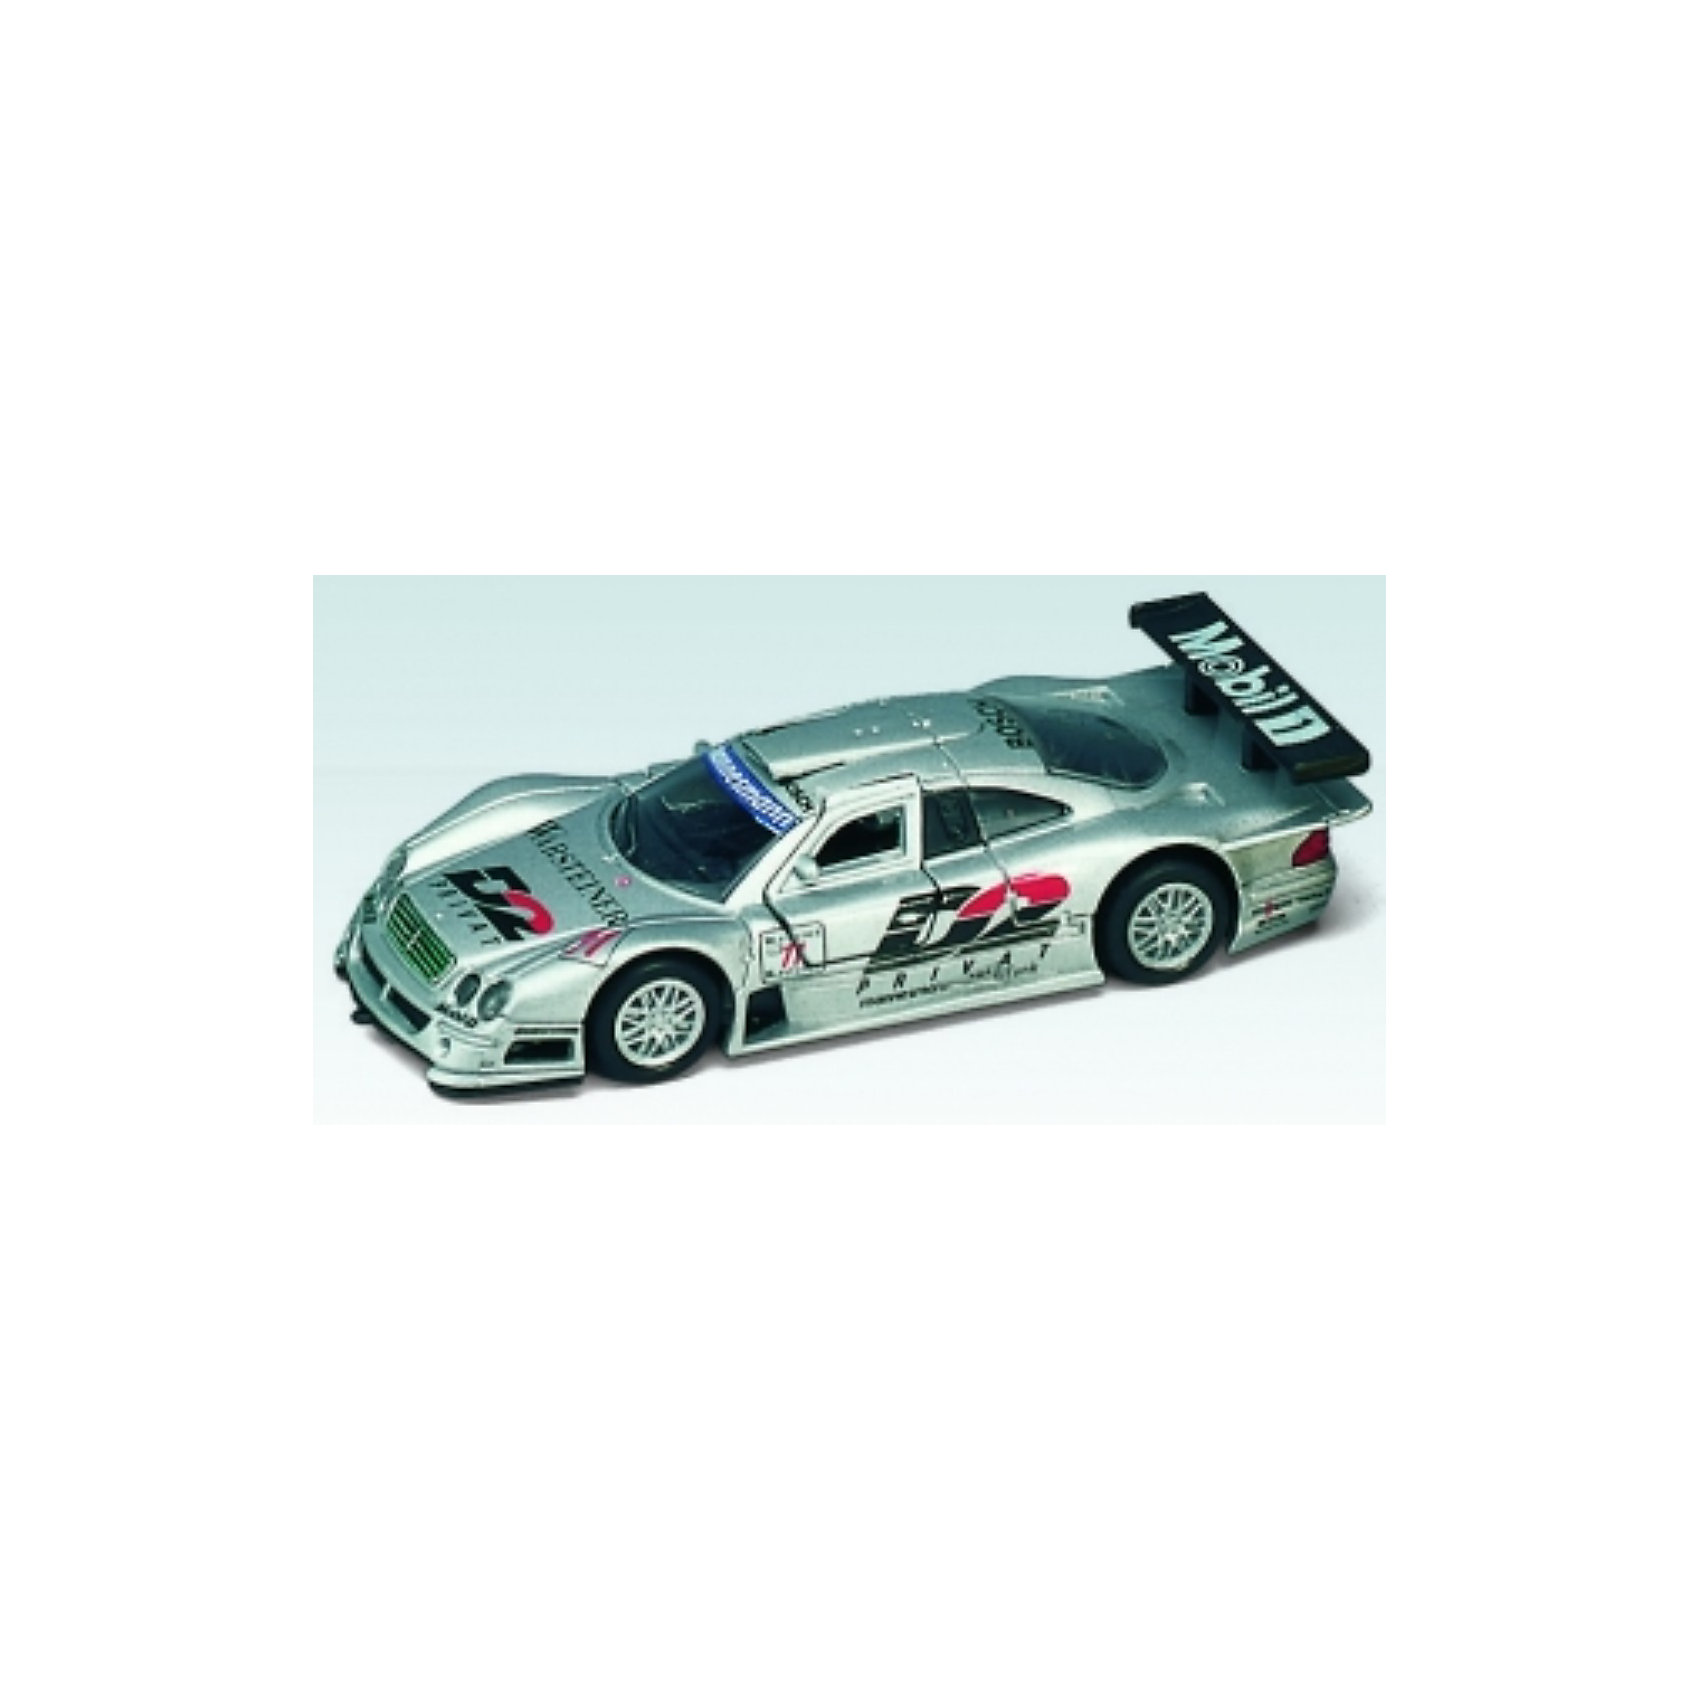 Модель машины 1:34-39 MB CLK-GTR, Welly